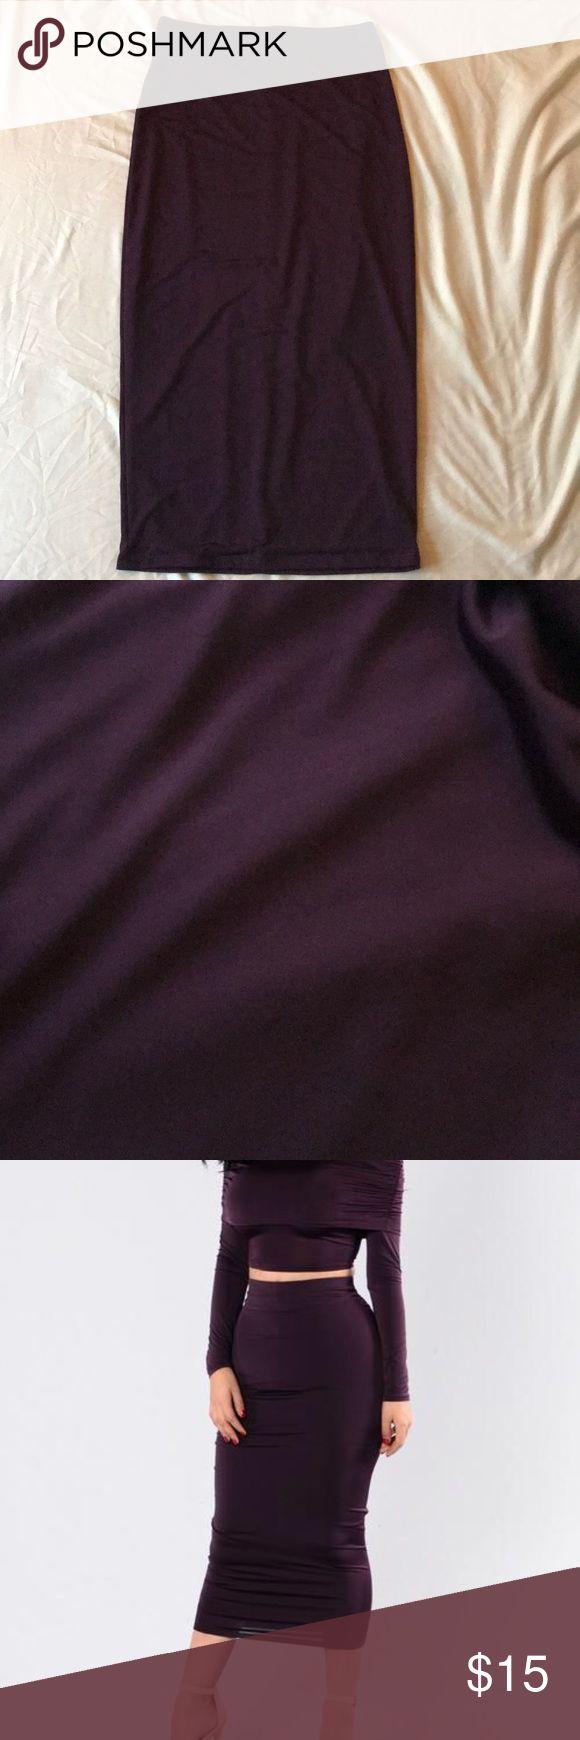 Plum Bodycon Midi Skirt Nice material super cute NWT Fashion Nova Skirts Midi